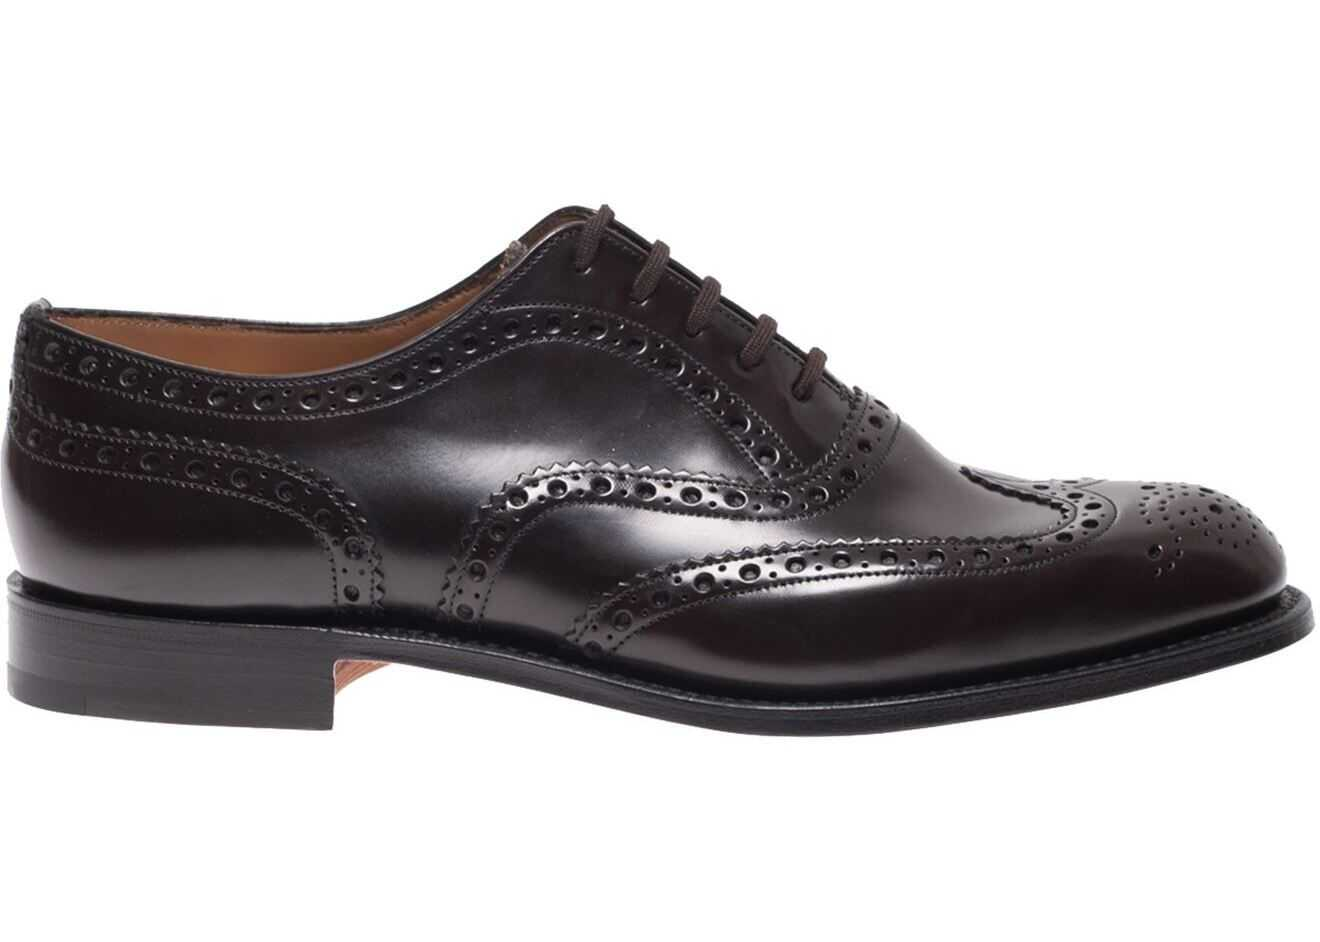 Church's Burwood Leather Oxford Shoes In Brown EEB2649XVF0AMA Brown imagine b-mall.ro